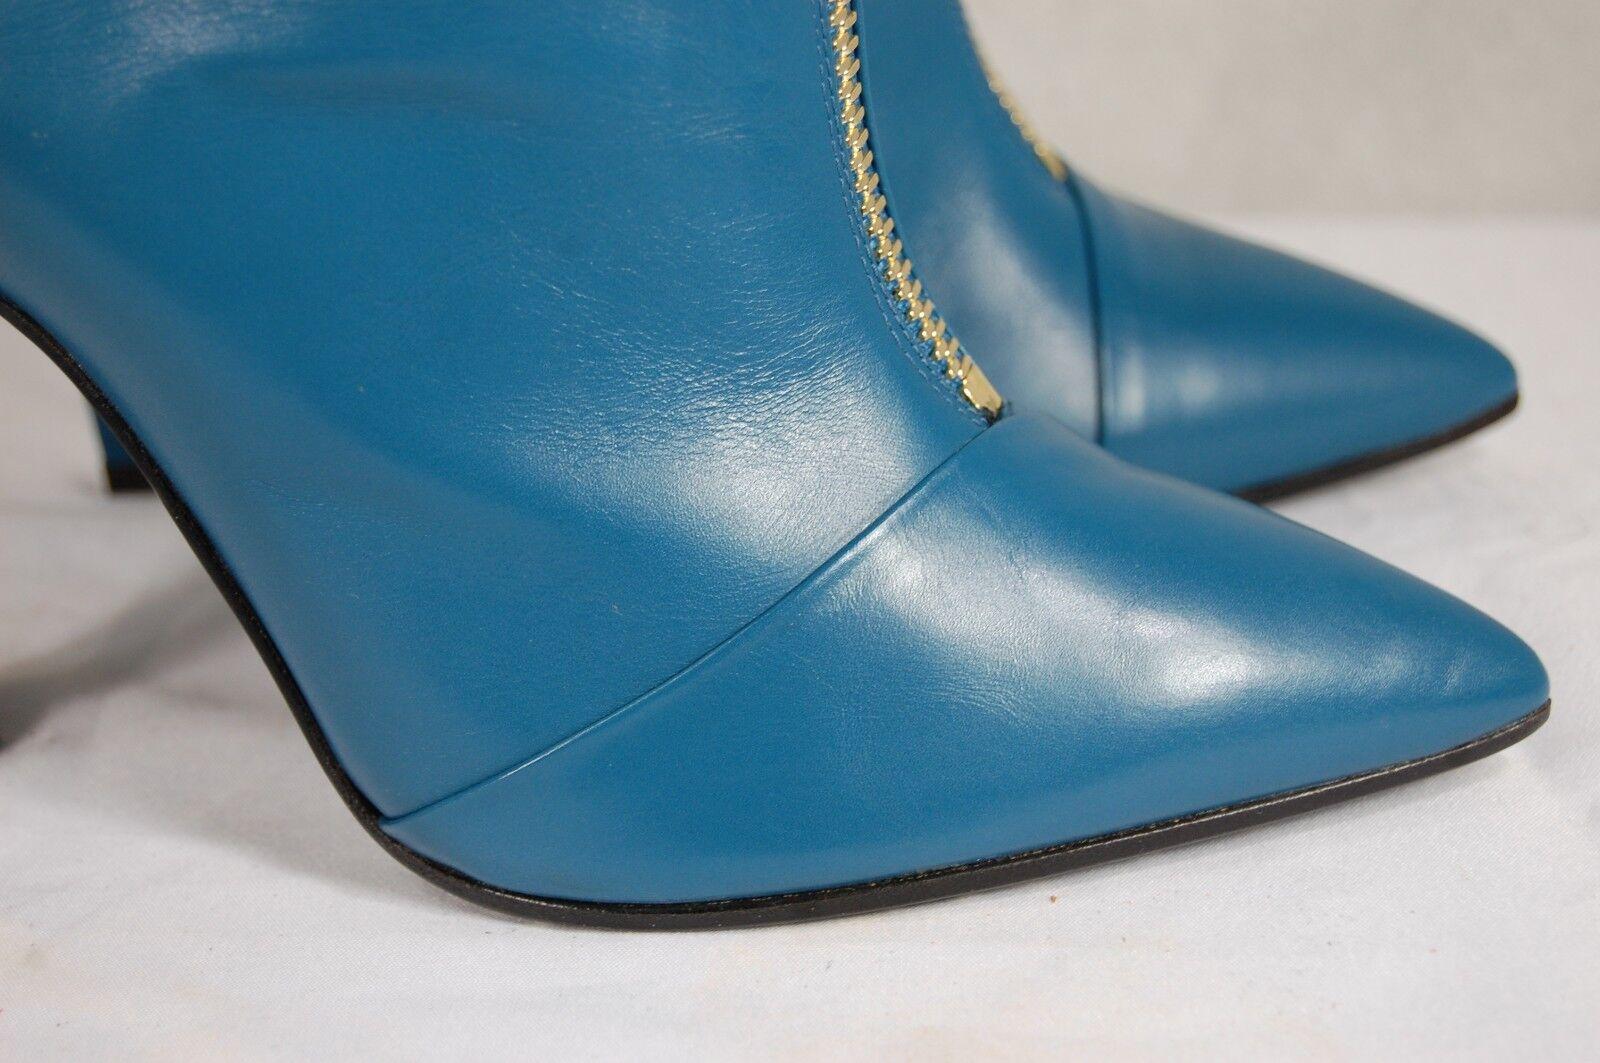 Emanuel Ungaro Hecho en Italia Mujer Tacón Tacón Tacón Alto botas De Cuero Azul EU 39 nos 8.5 baa995